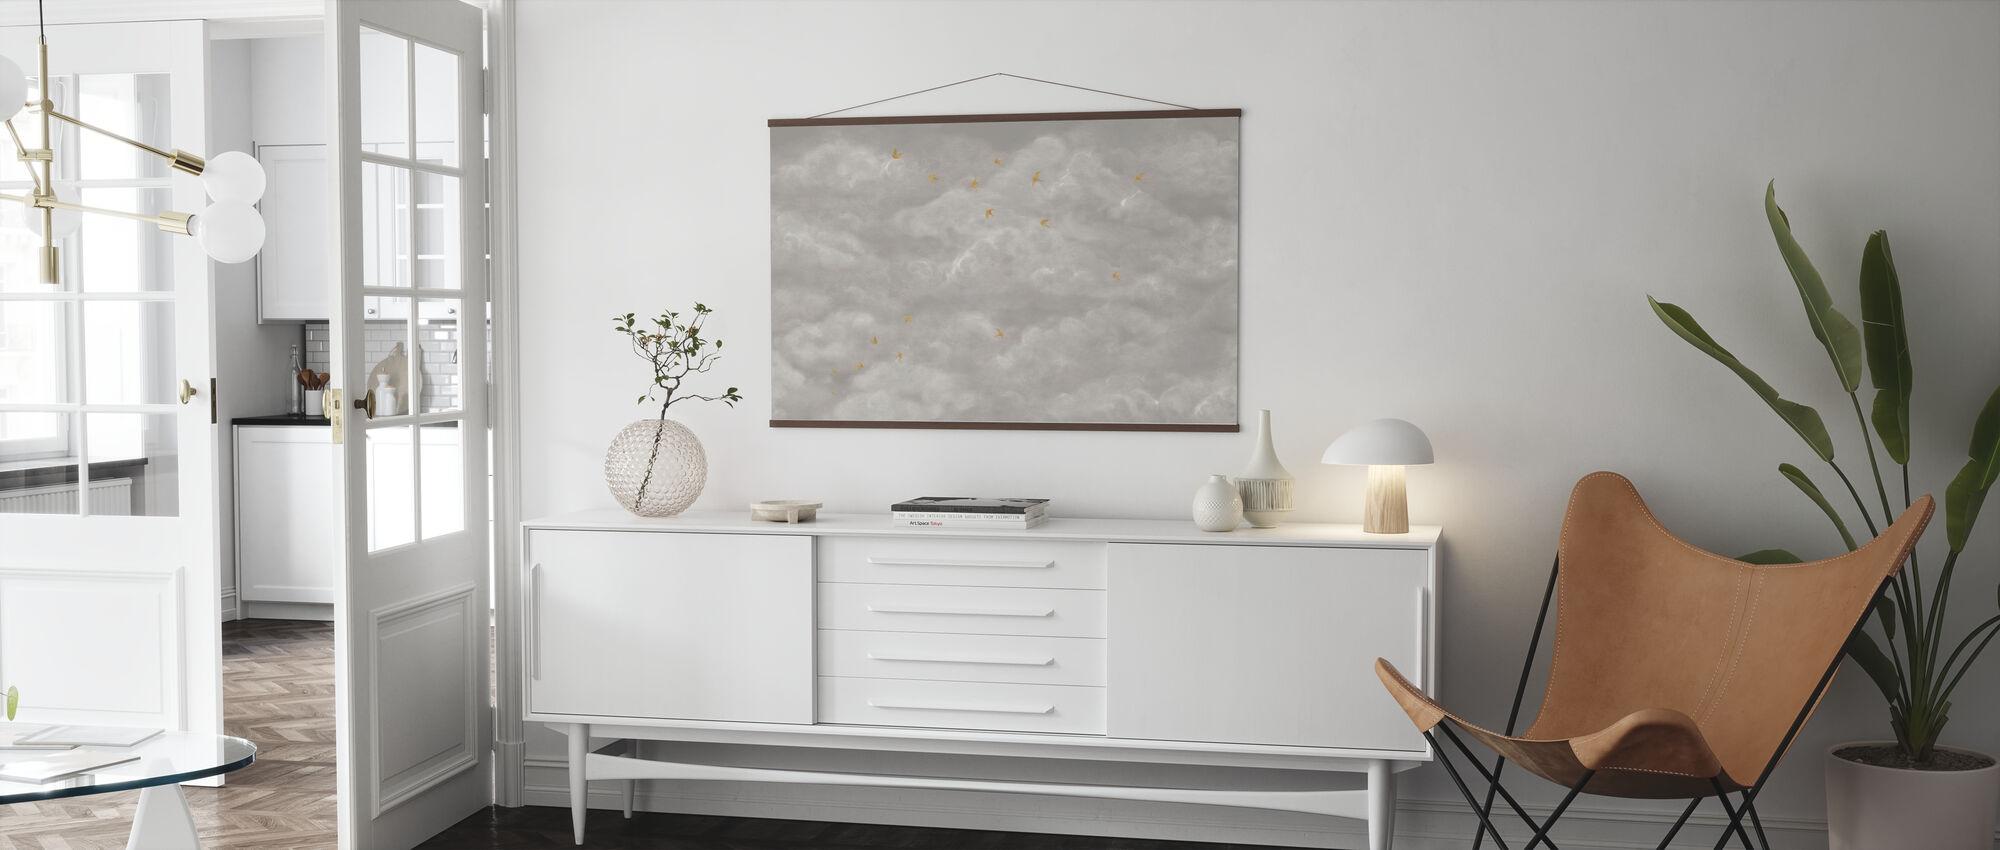 Tender Wolken met Gele Zwaluwen - Beige - Poster - Woonkamer